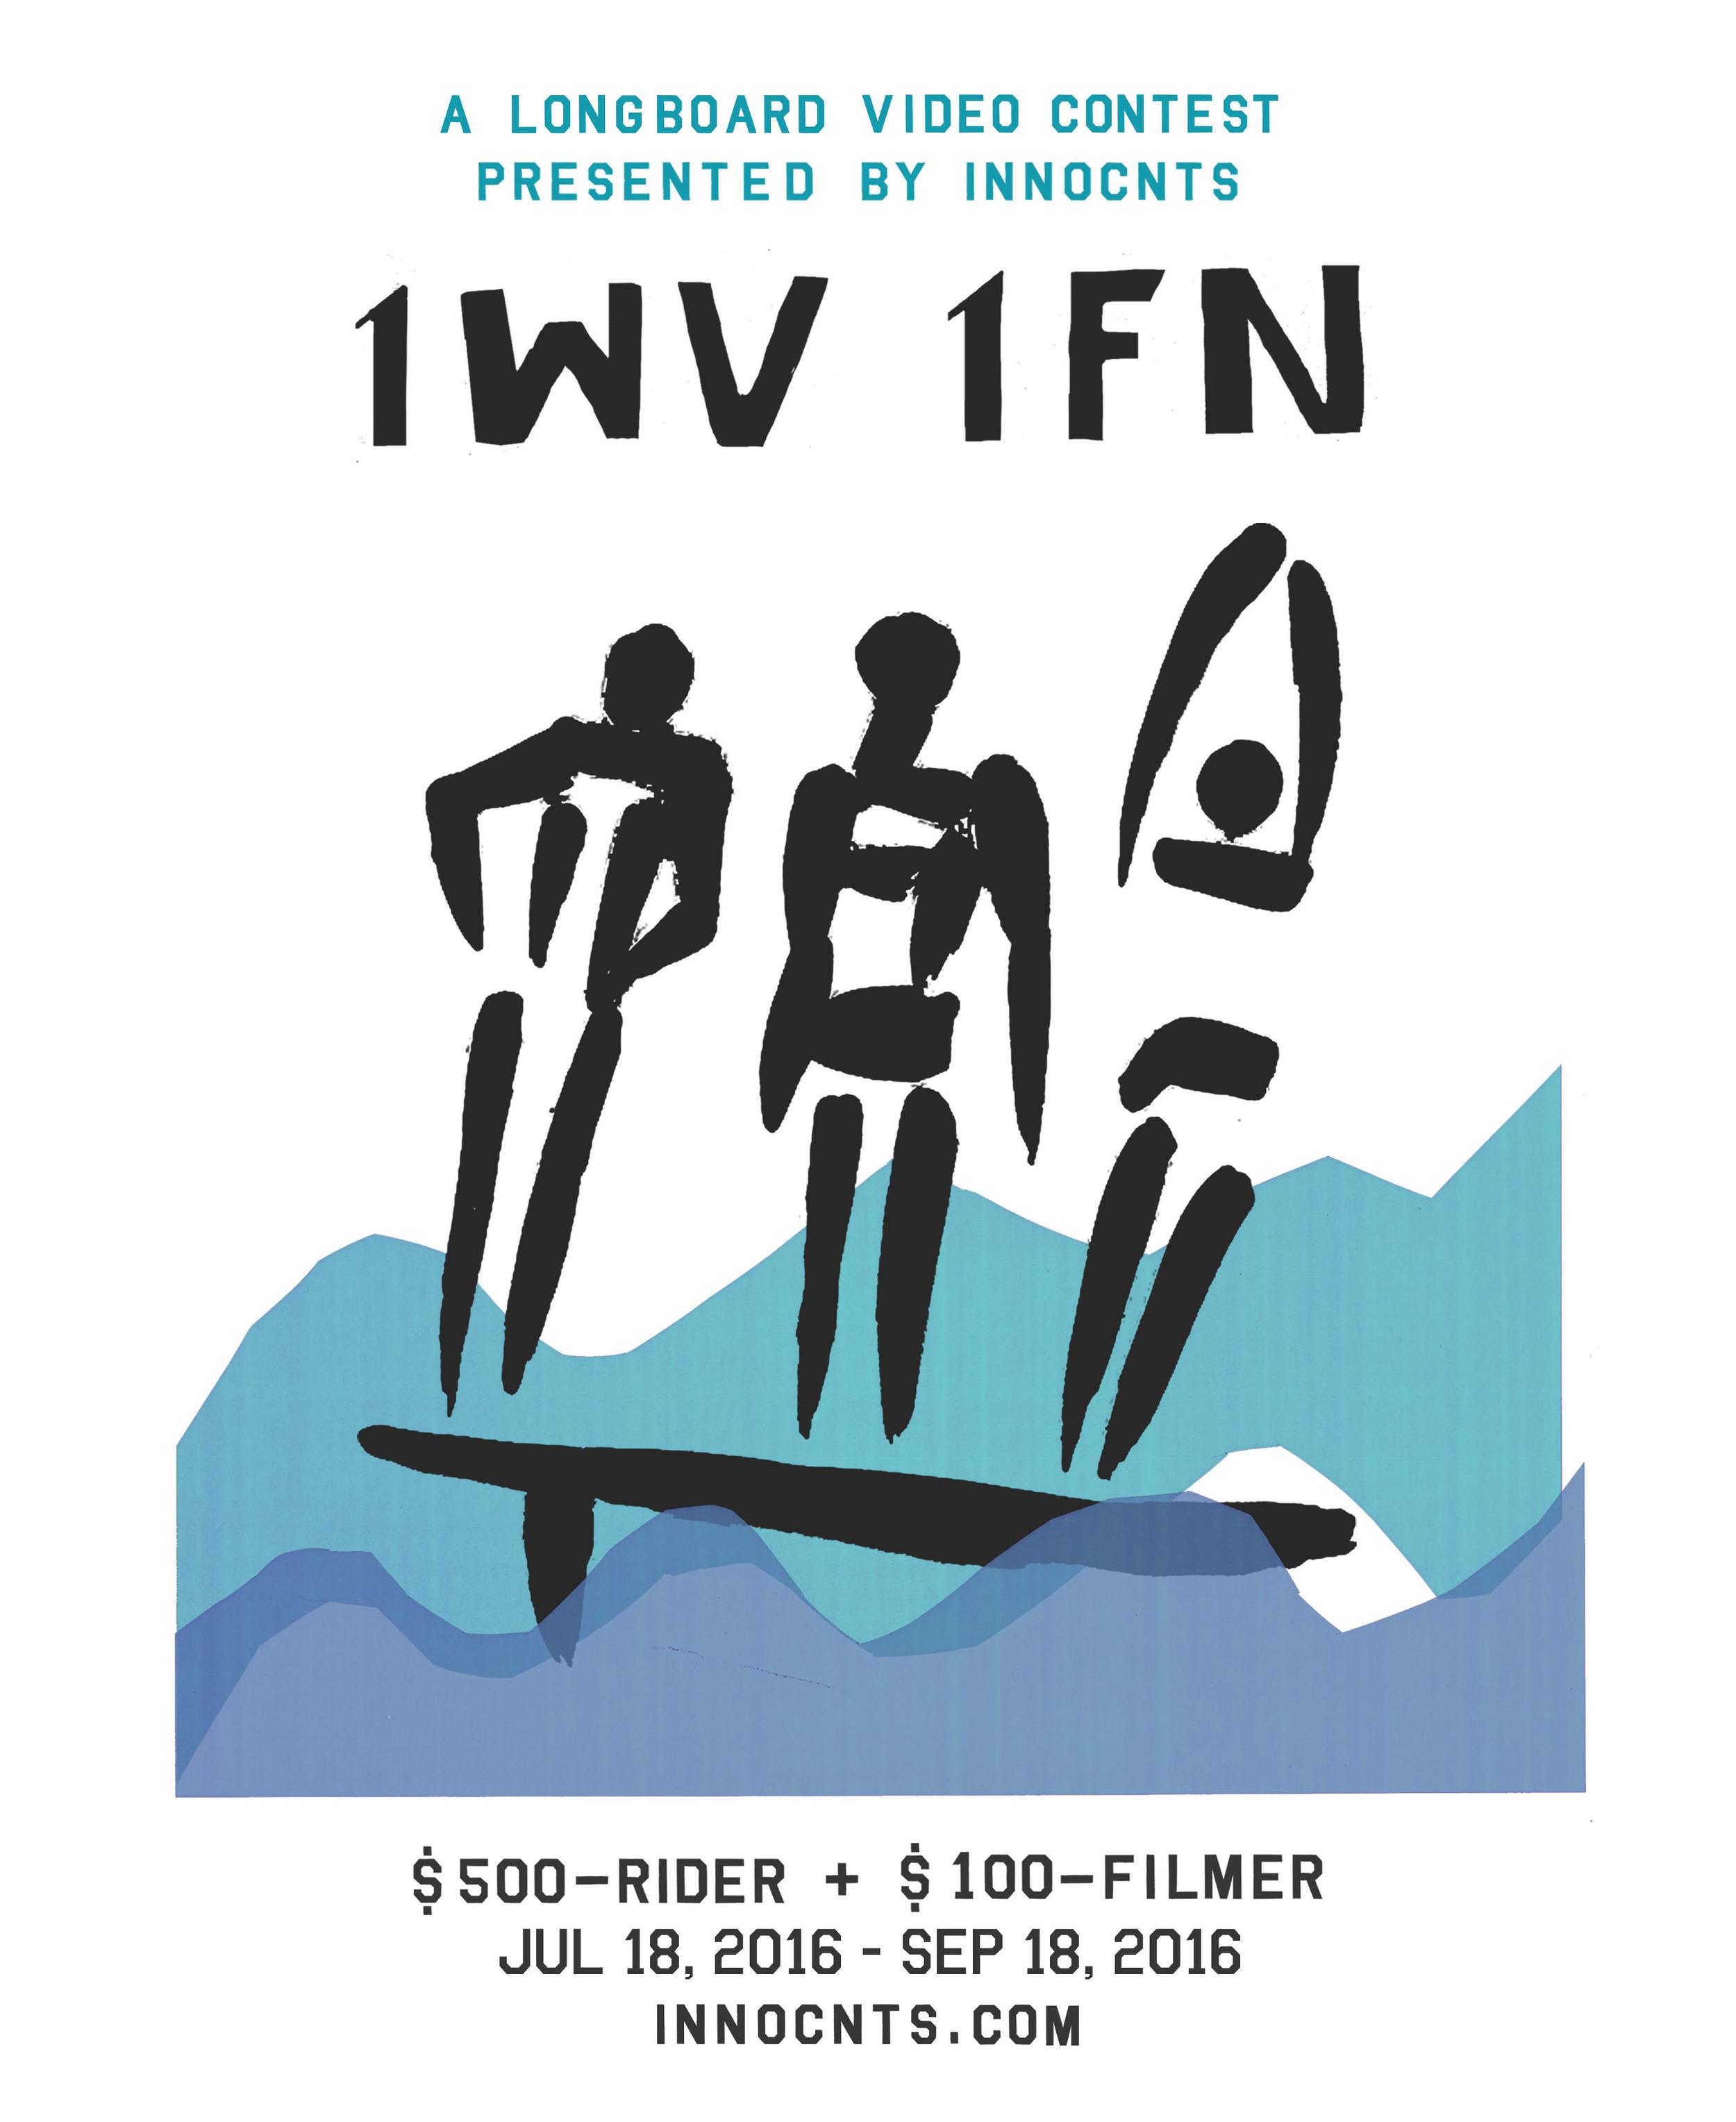 innocnts log contest 1wv1fn poster